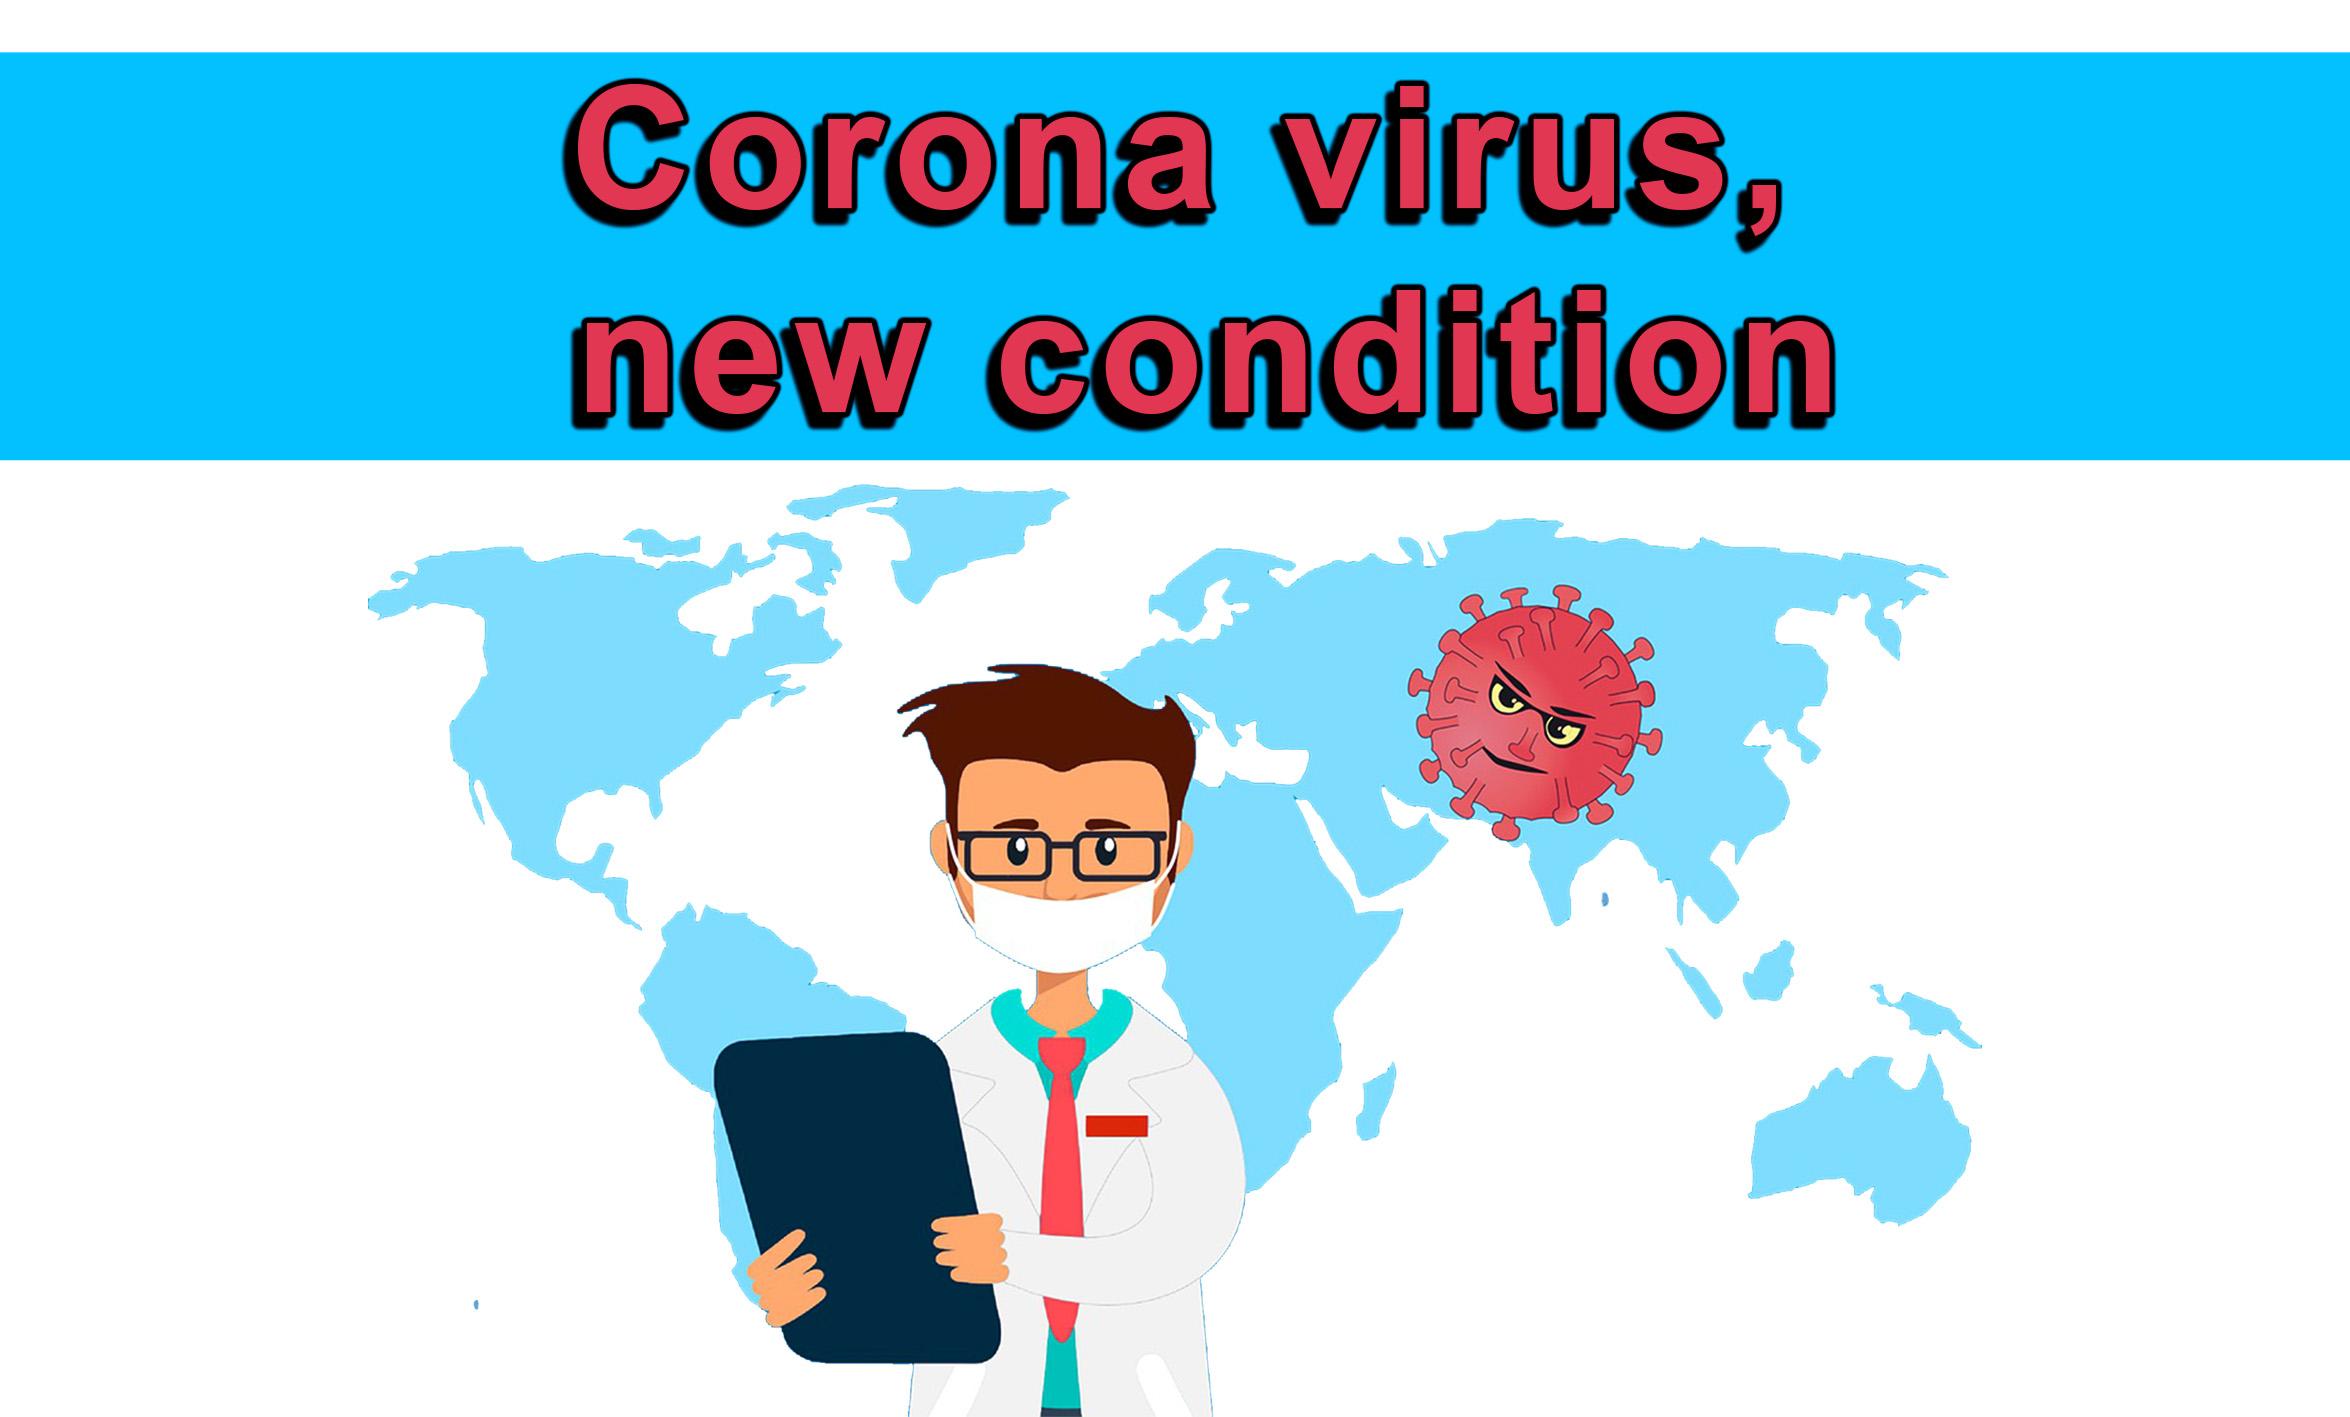 Corona virus, new condition